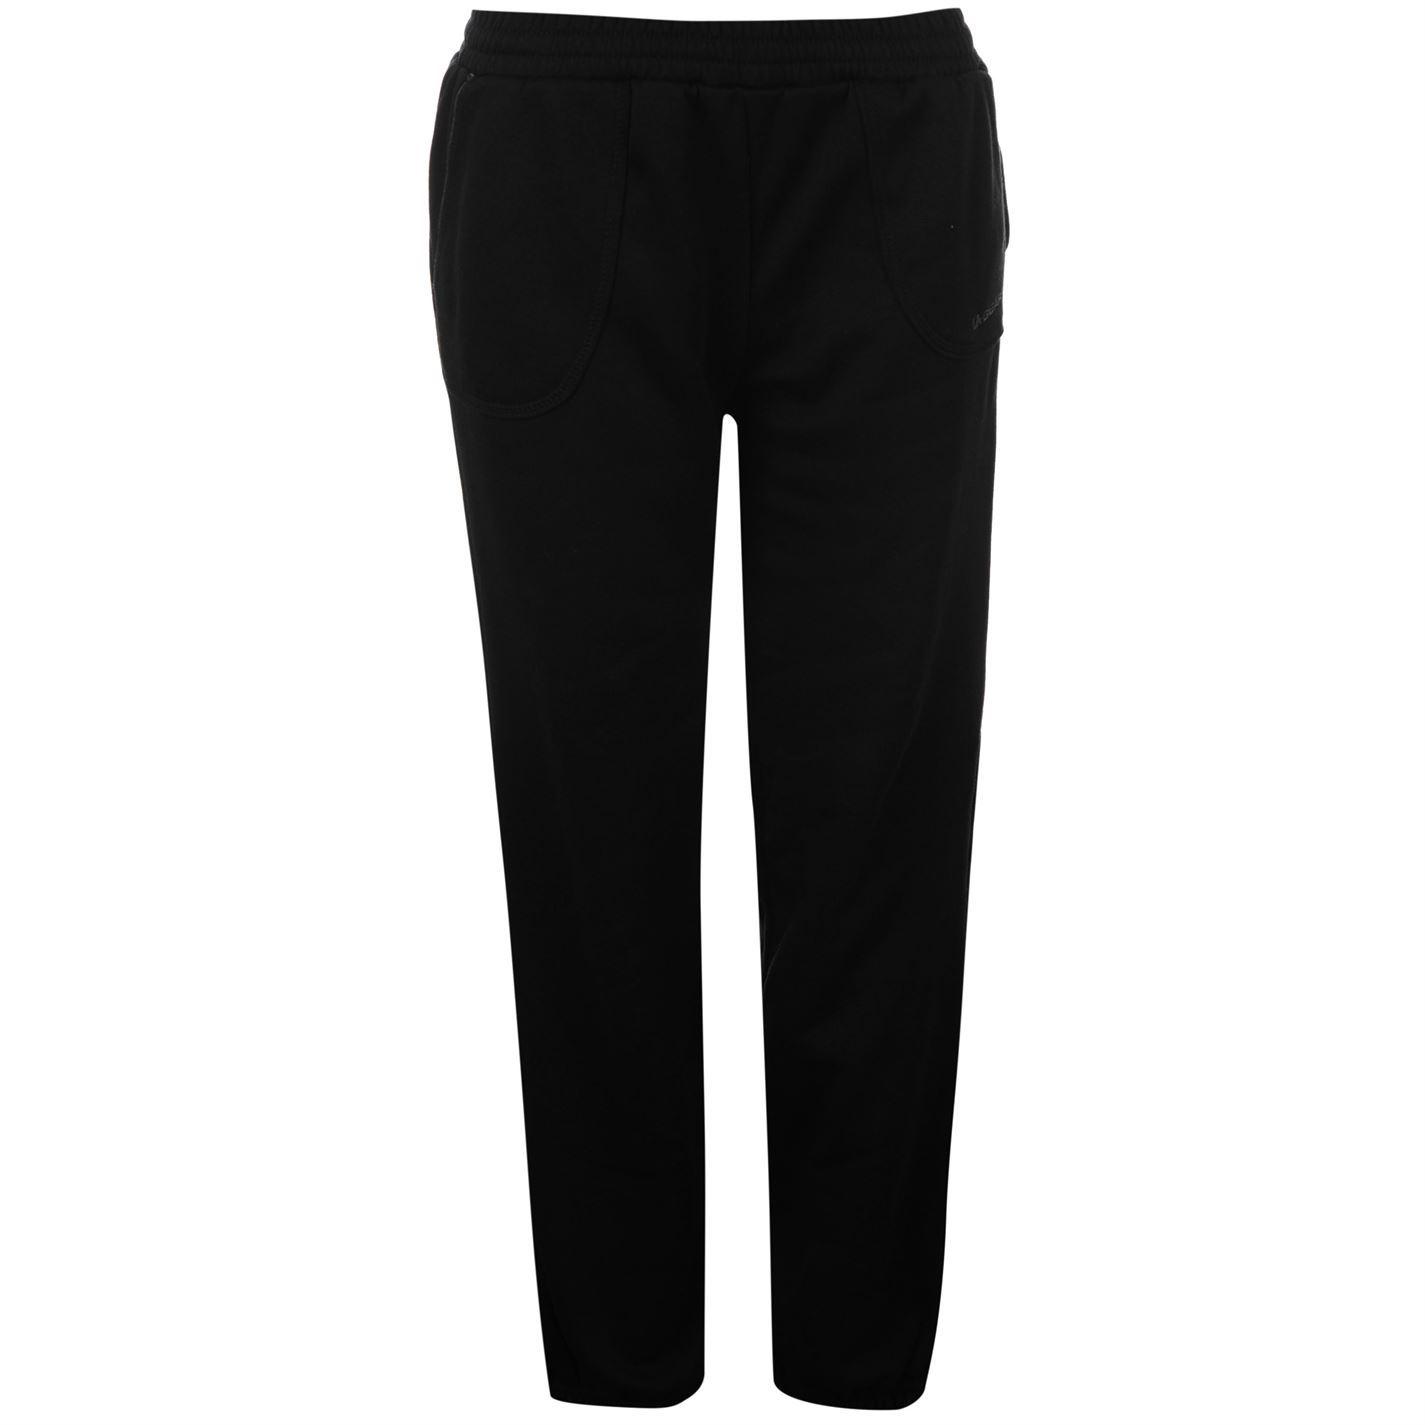 Model  PANT Women39s Jogging Pants Traininpants Trackies Jogging Pants  EBay